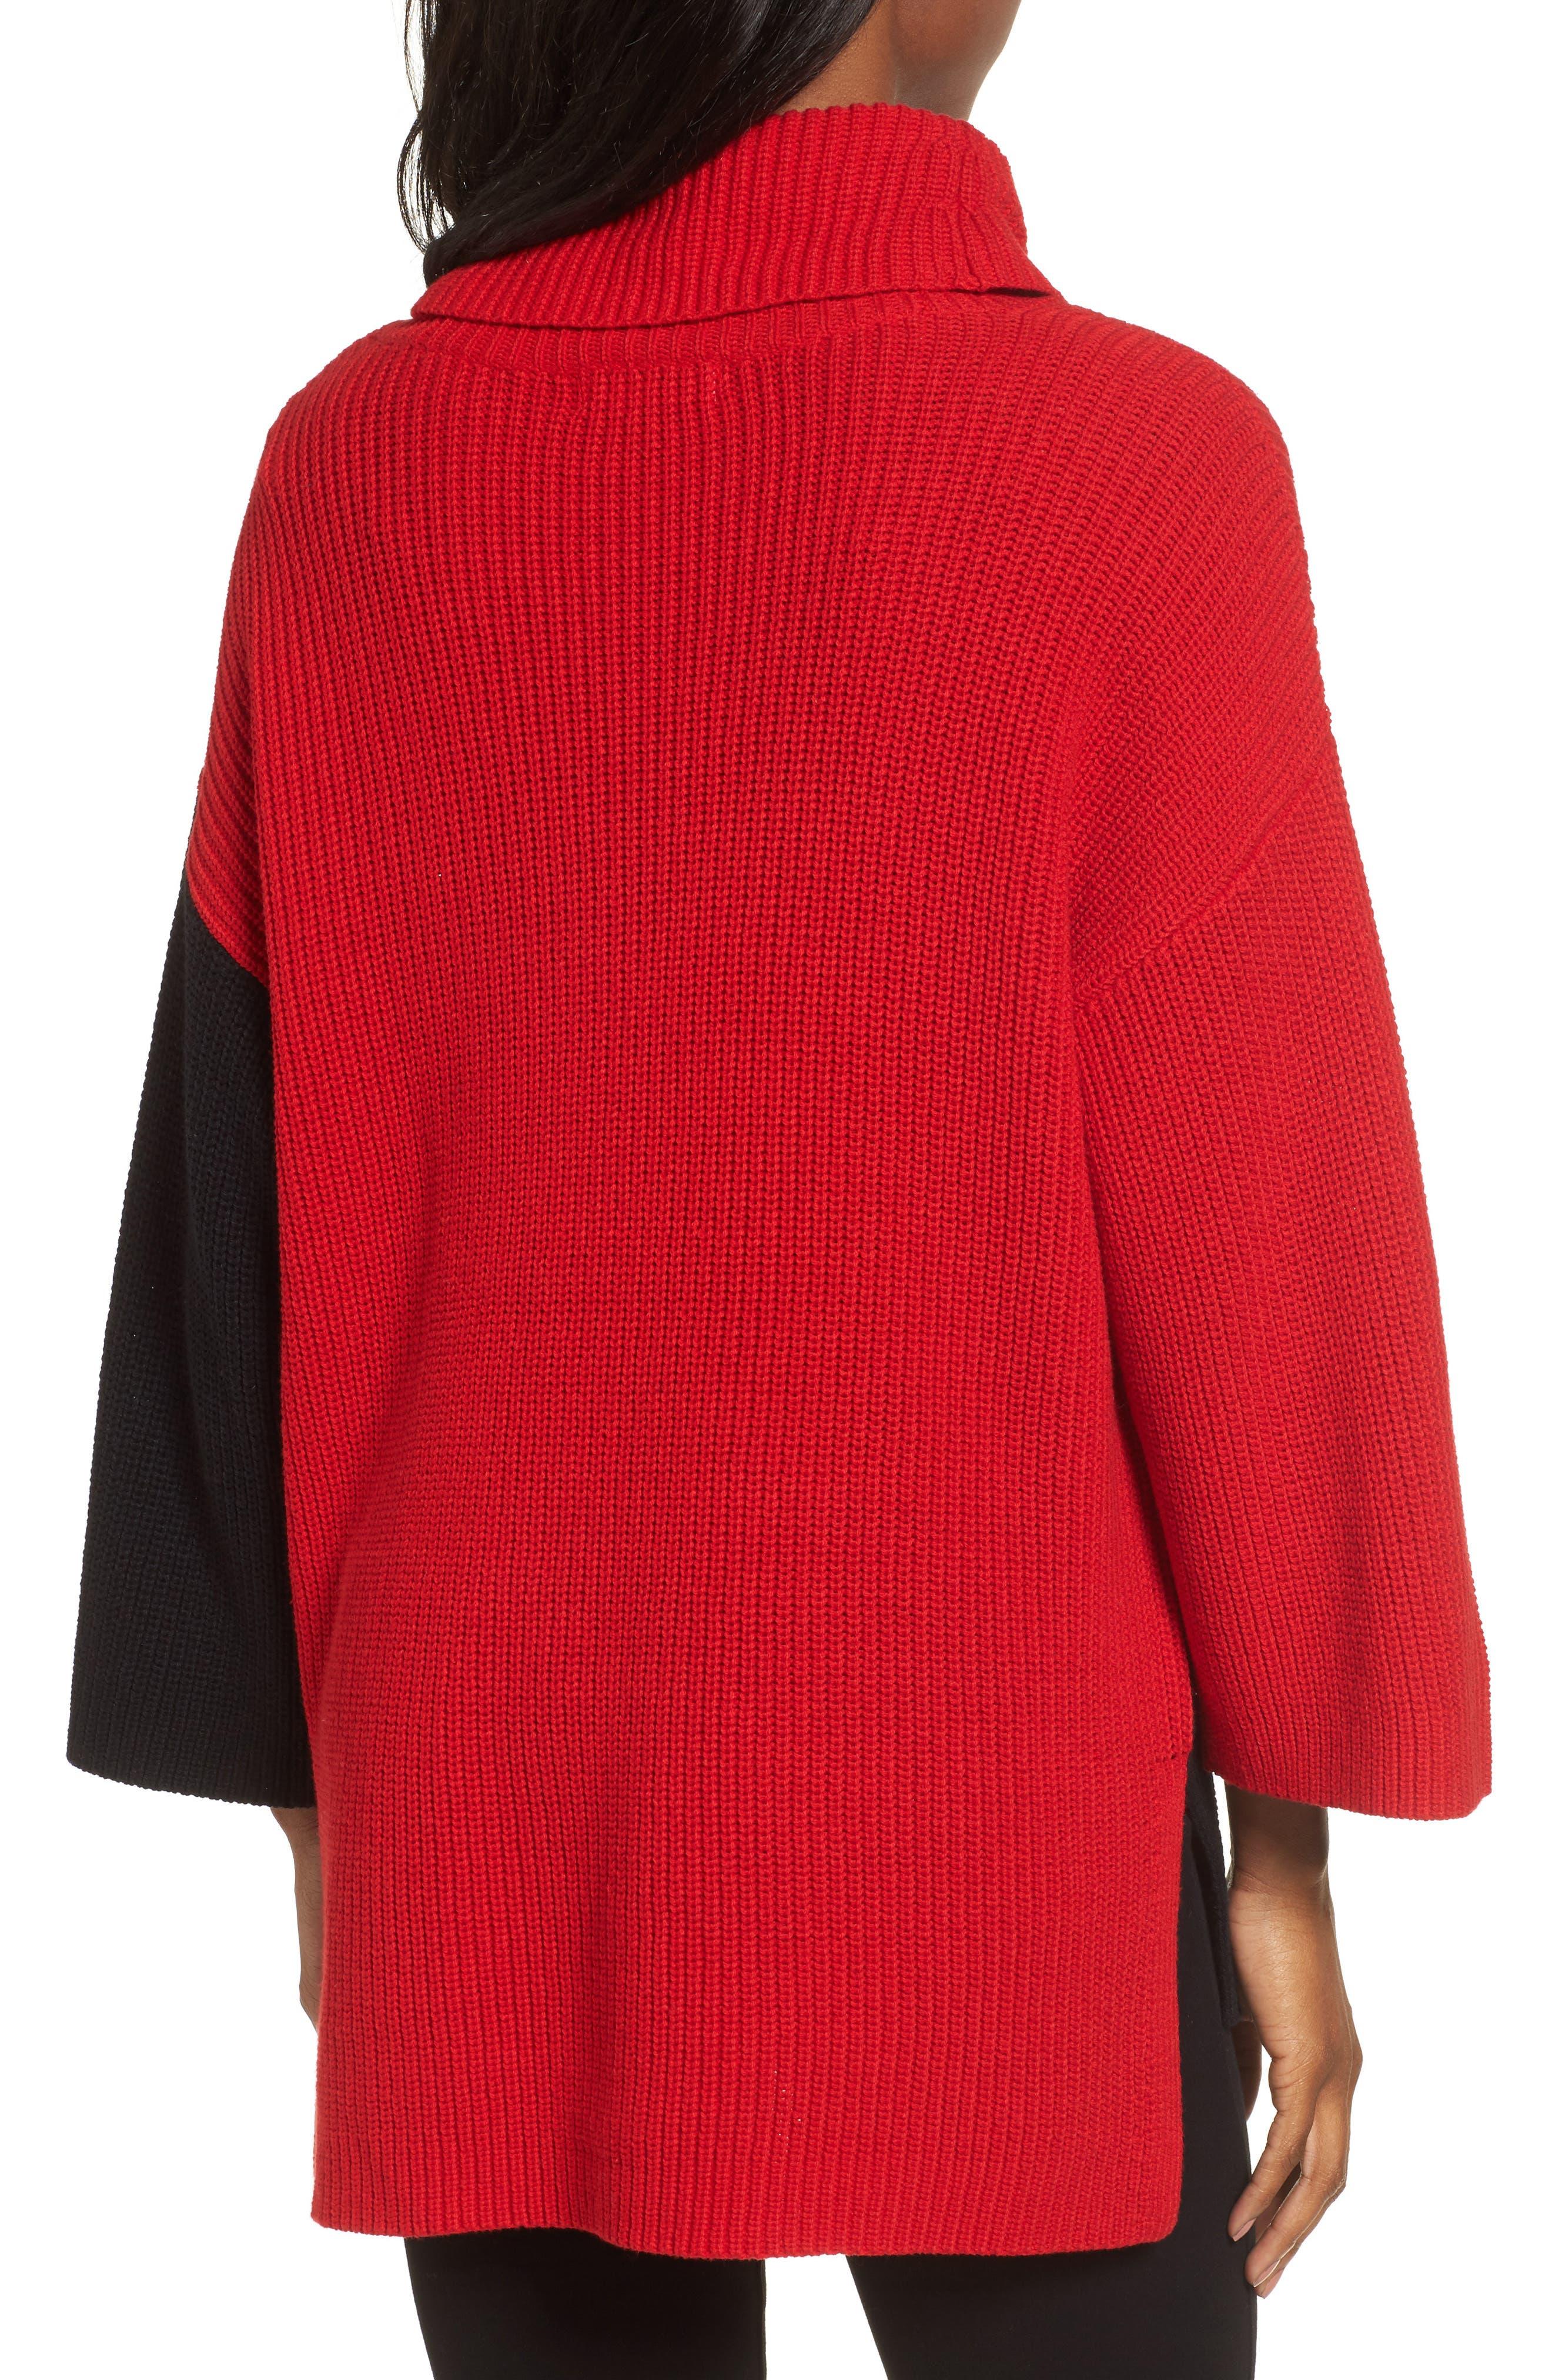 Colorblock Cowl Neck Sweater,                             Alternate thumbnail 2, color,                             Rouge